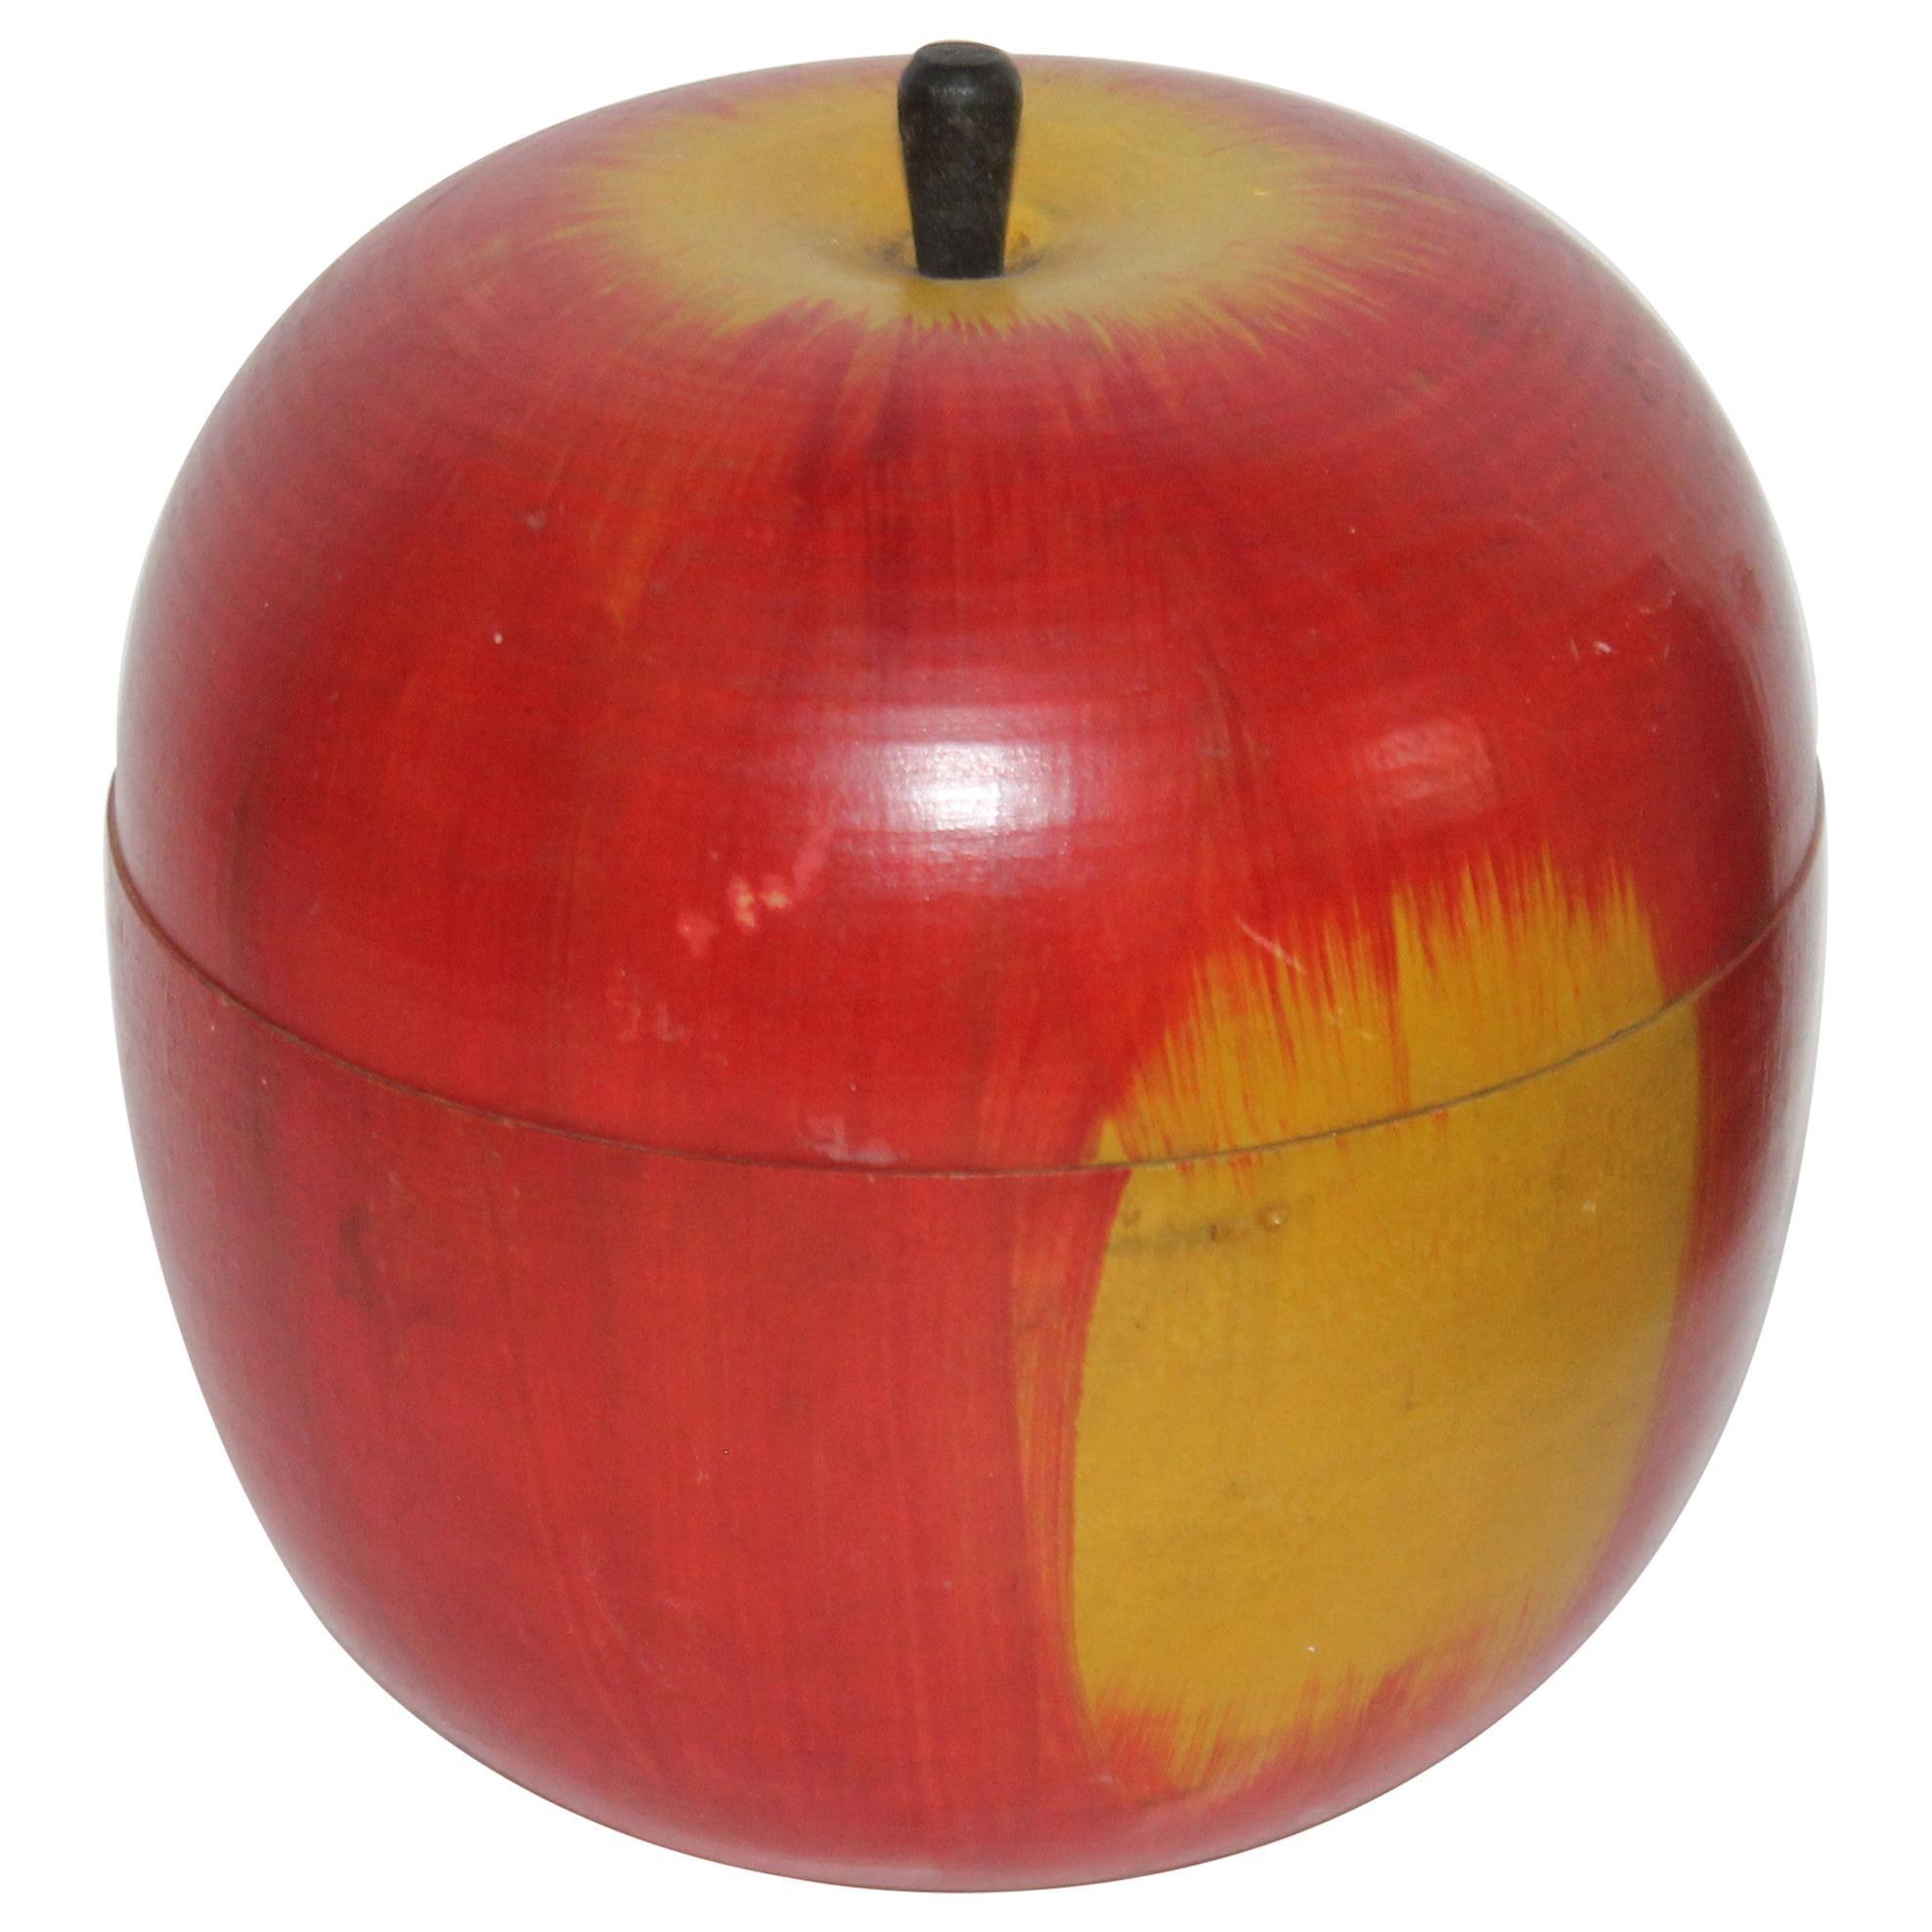 Original Painted Wood Apple